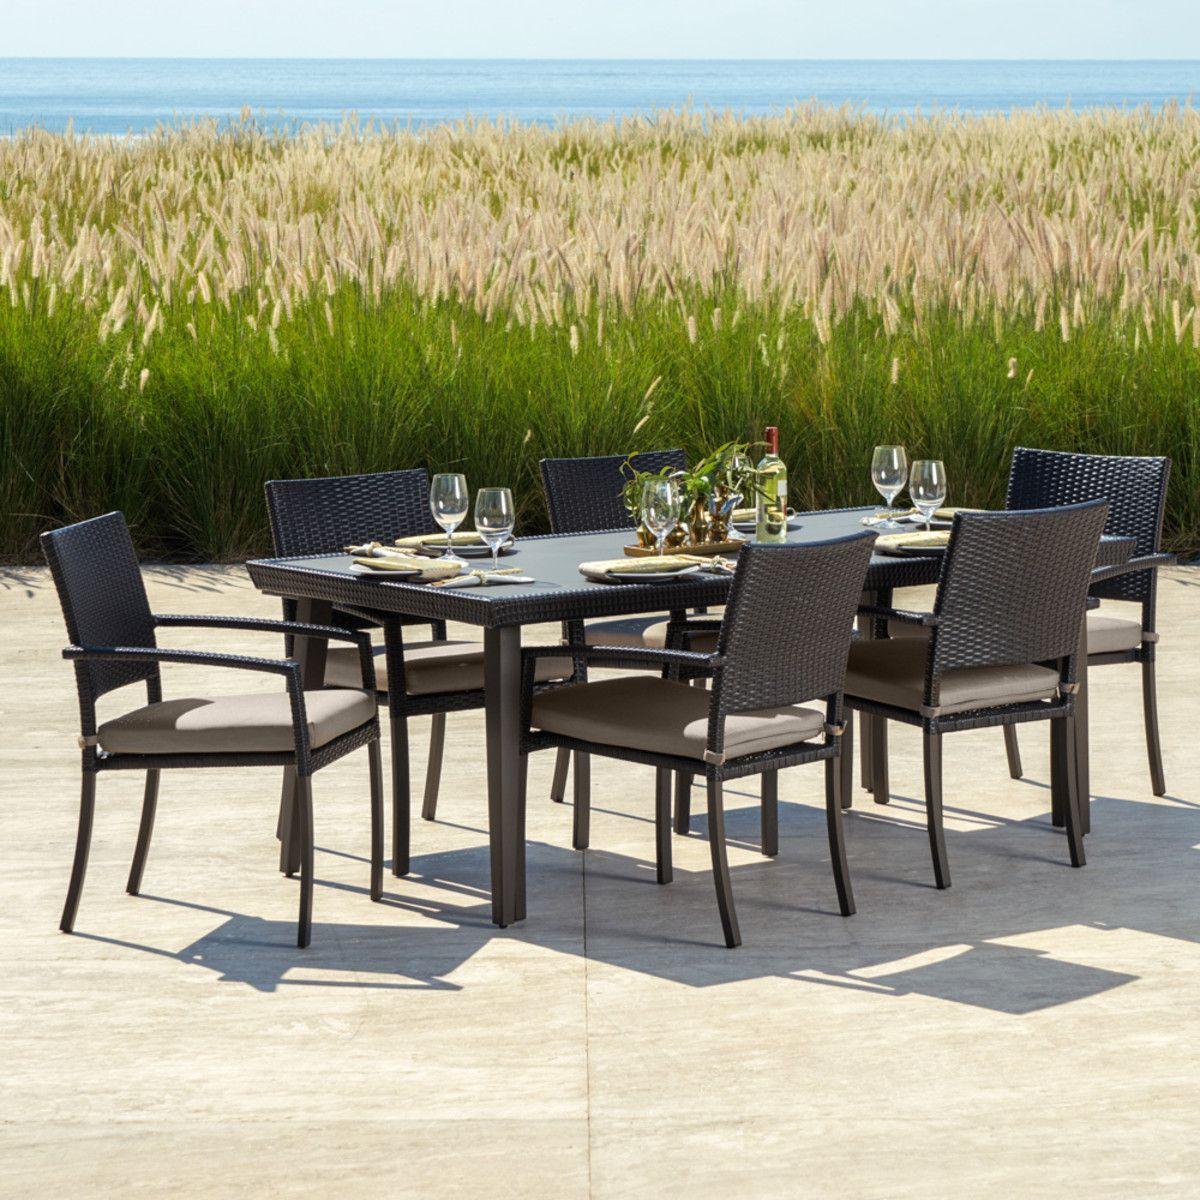 Portofino Casual 7pc Dining Set Taupe Mist Rst Brands Outdoor Dining Set 7 Piece Dining Set Outdoor Furniture Sets